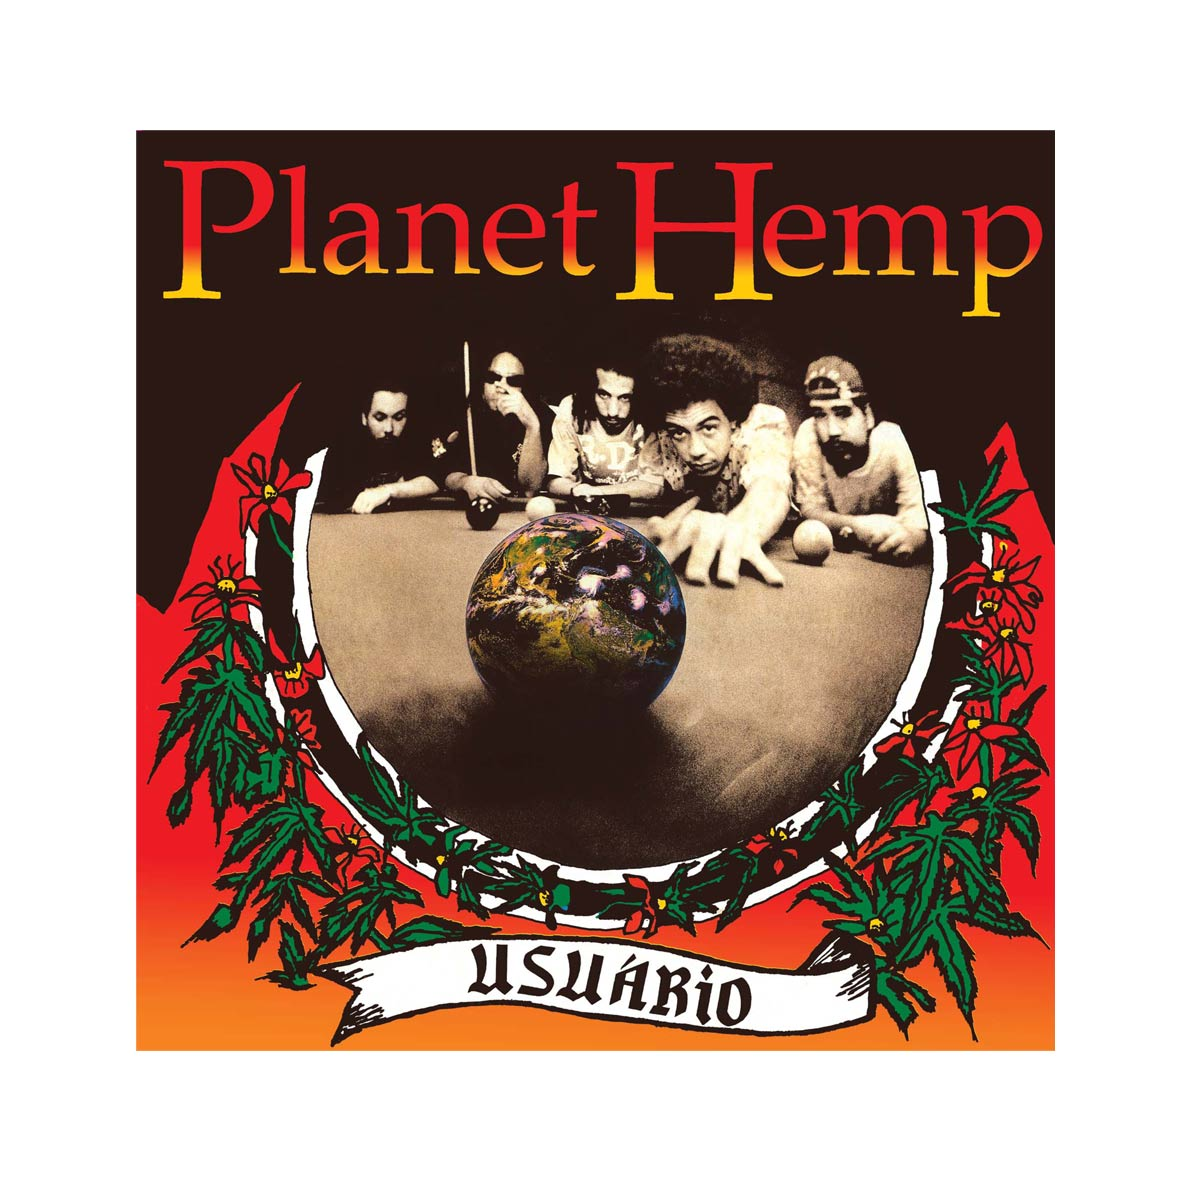 LP Planet Hemp Usu�rio